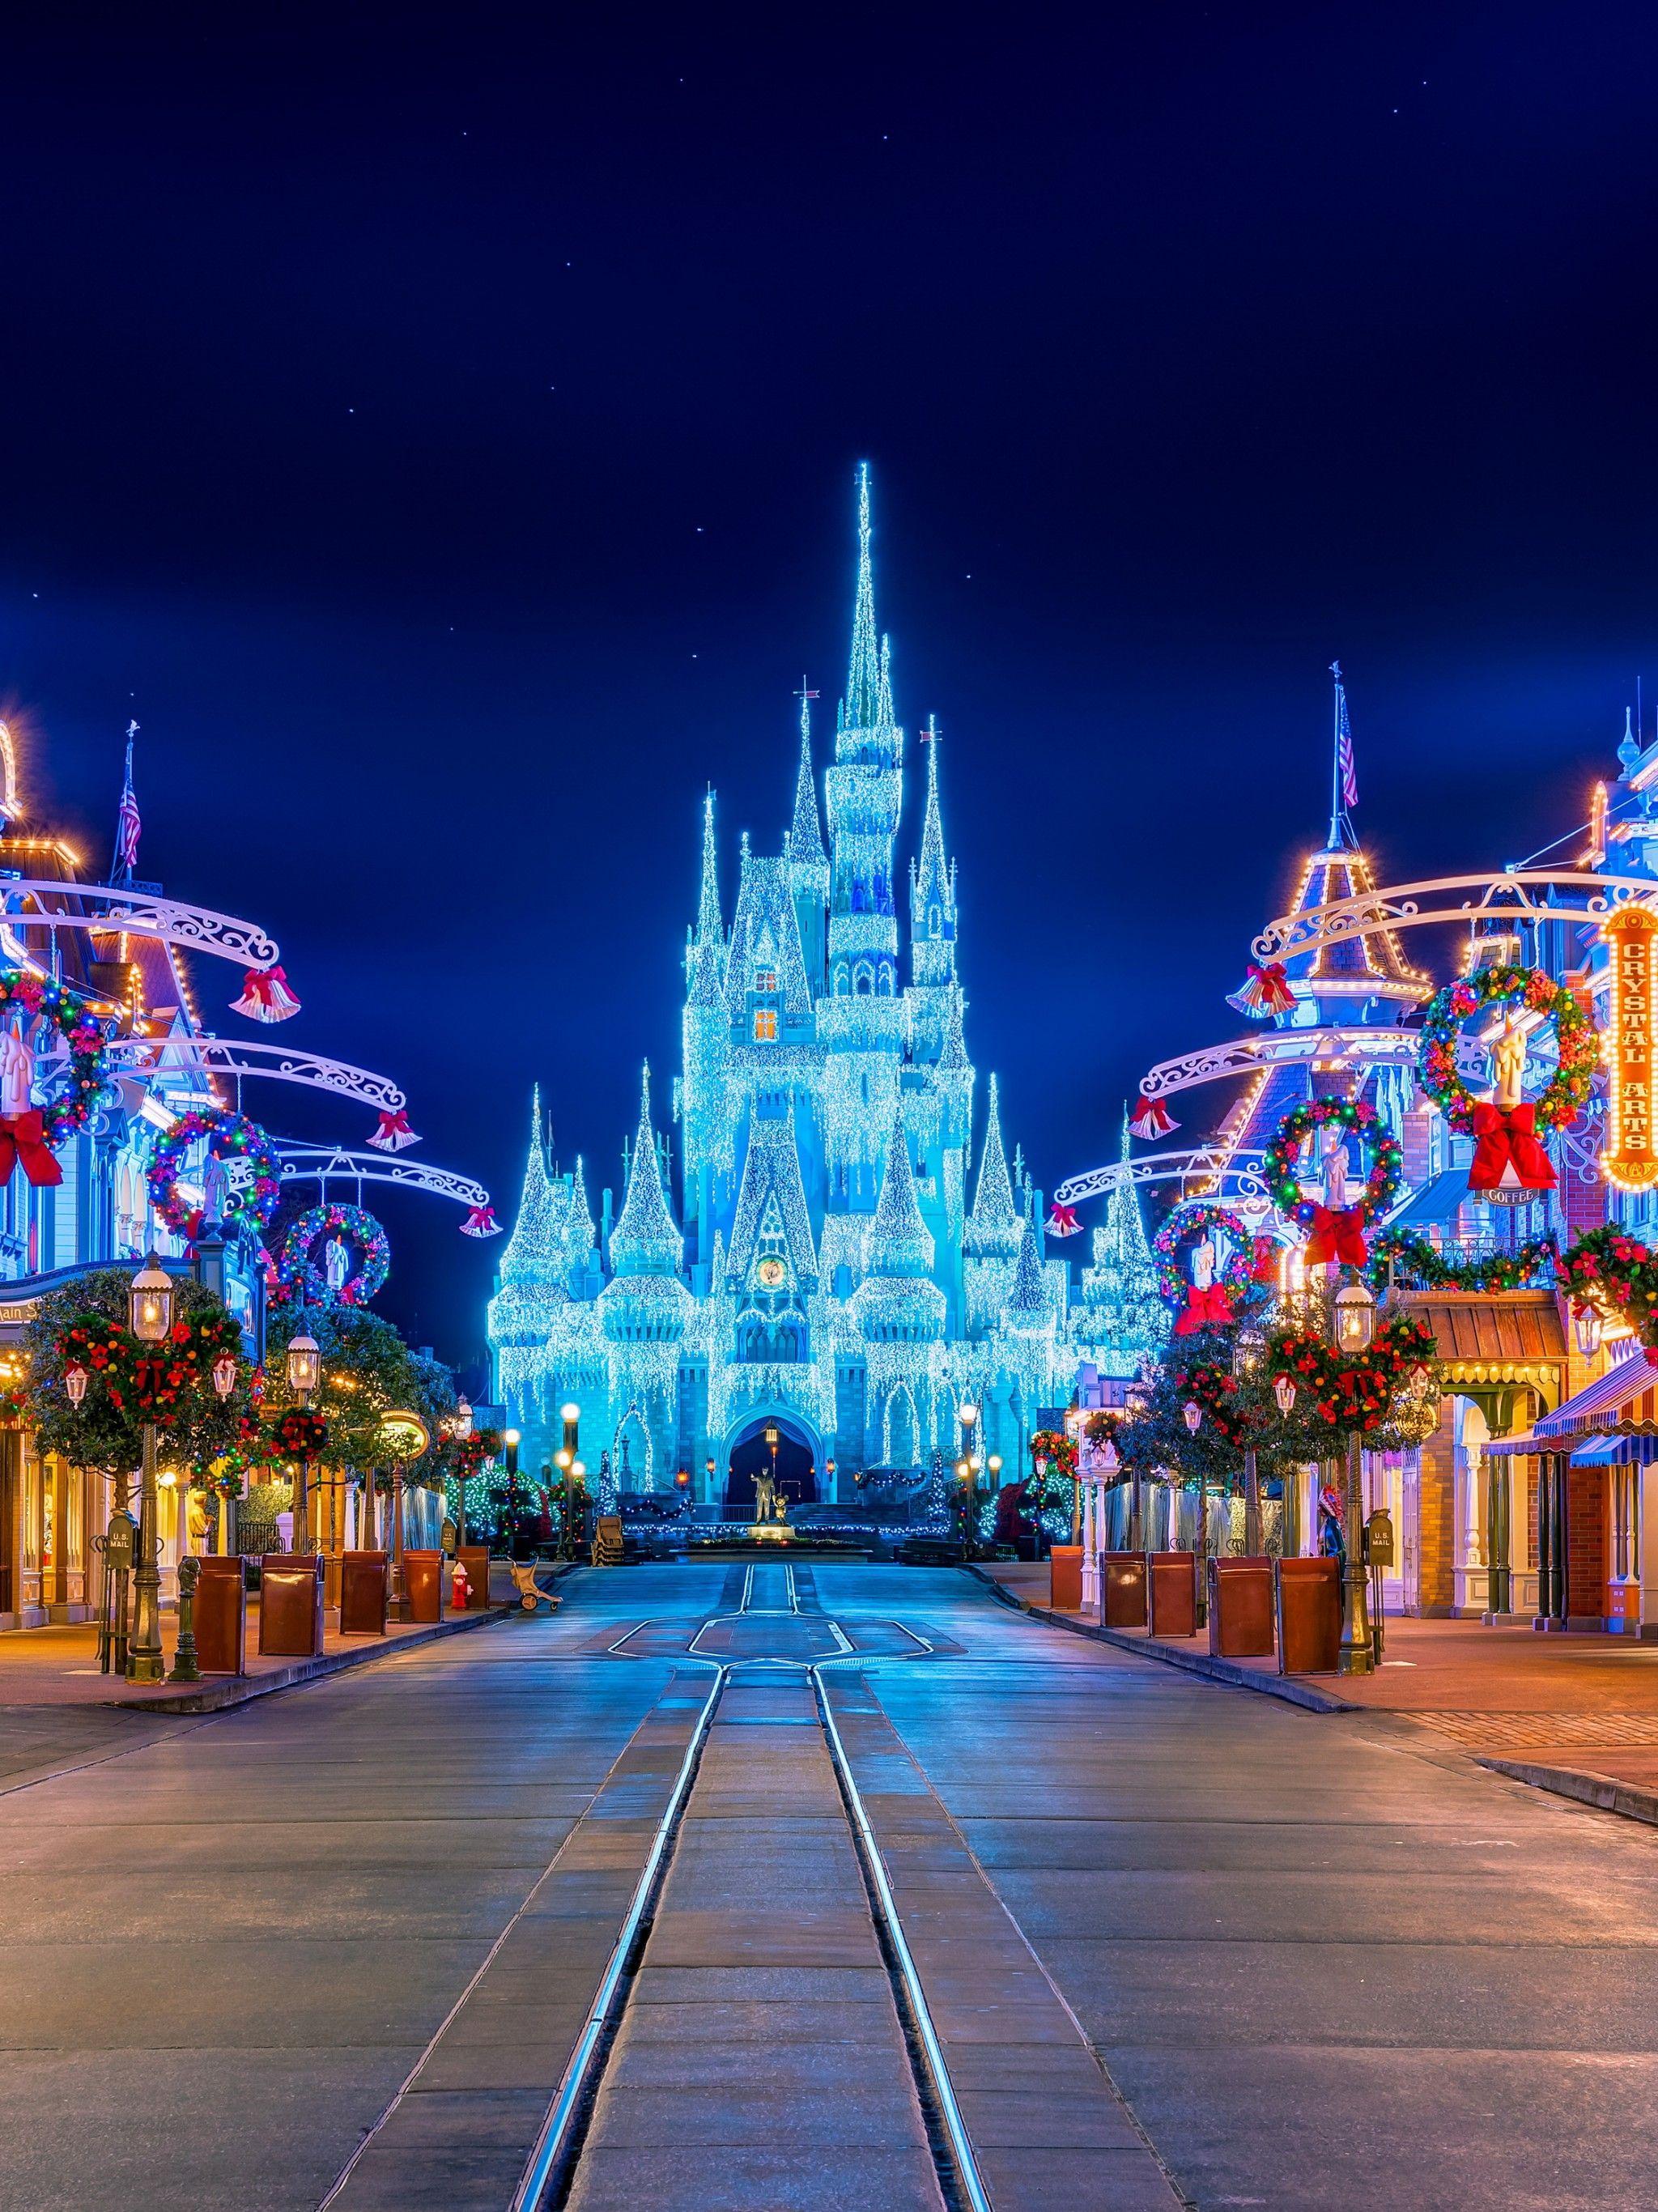 Castle Disney Christmas Wallpapers Wallpaper Cave